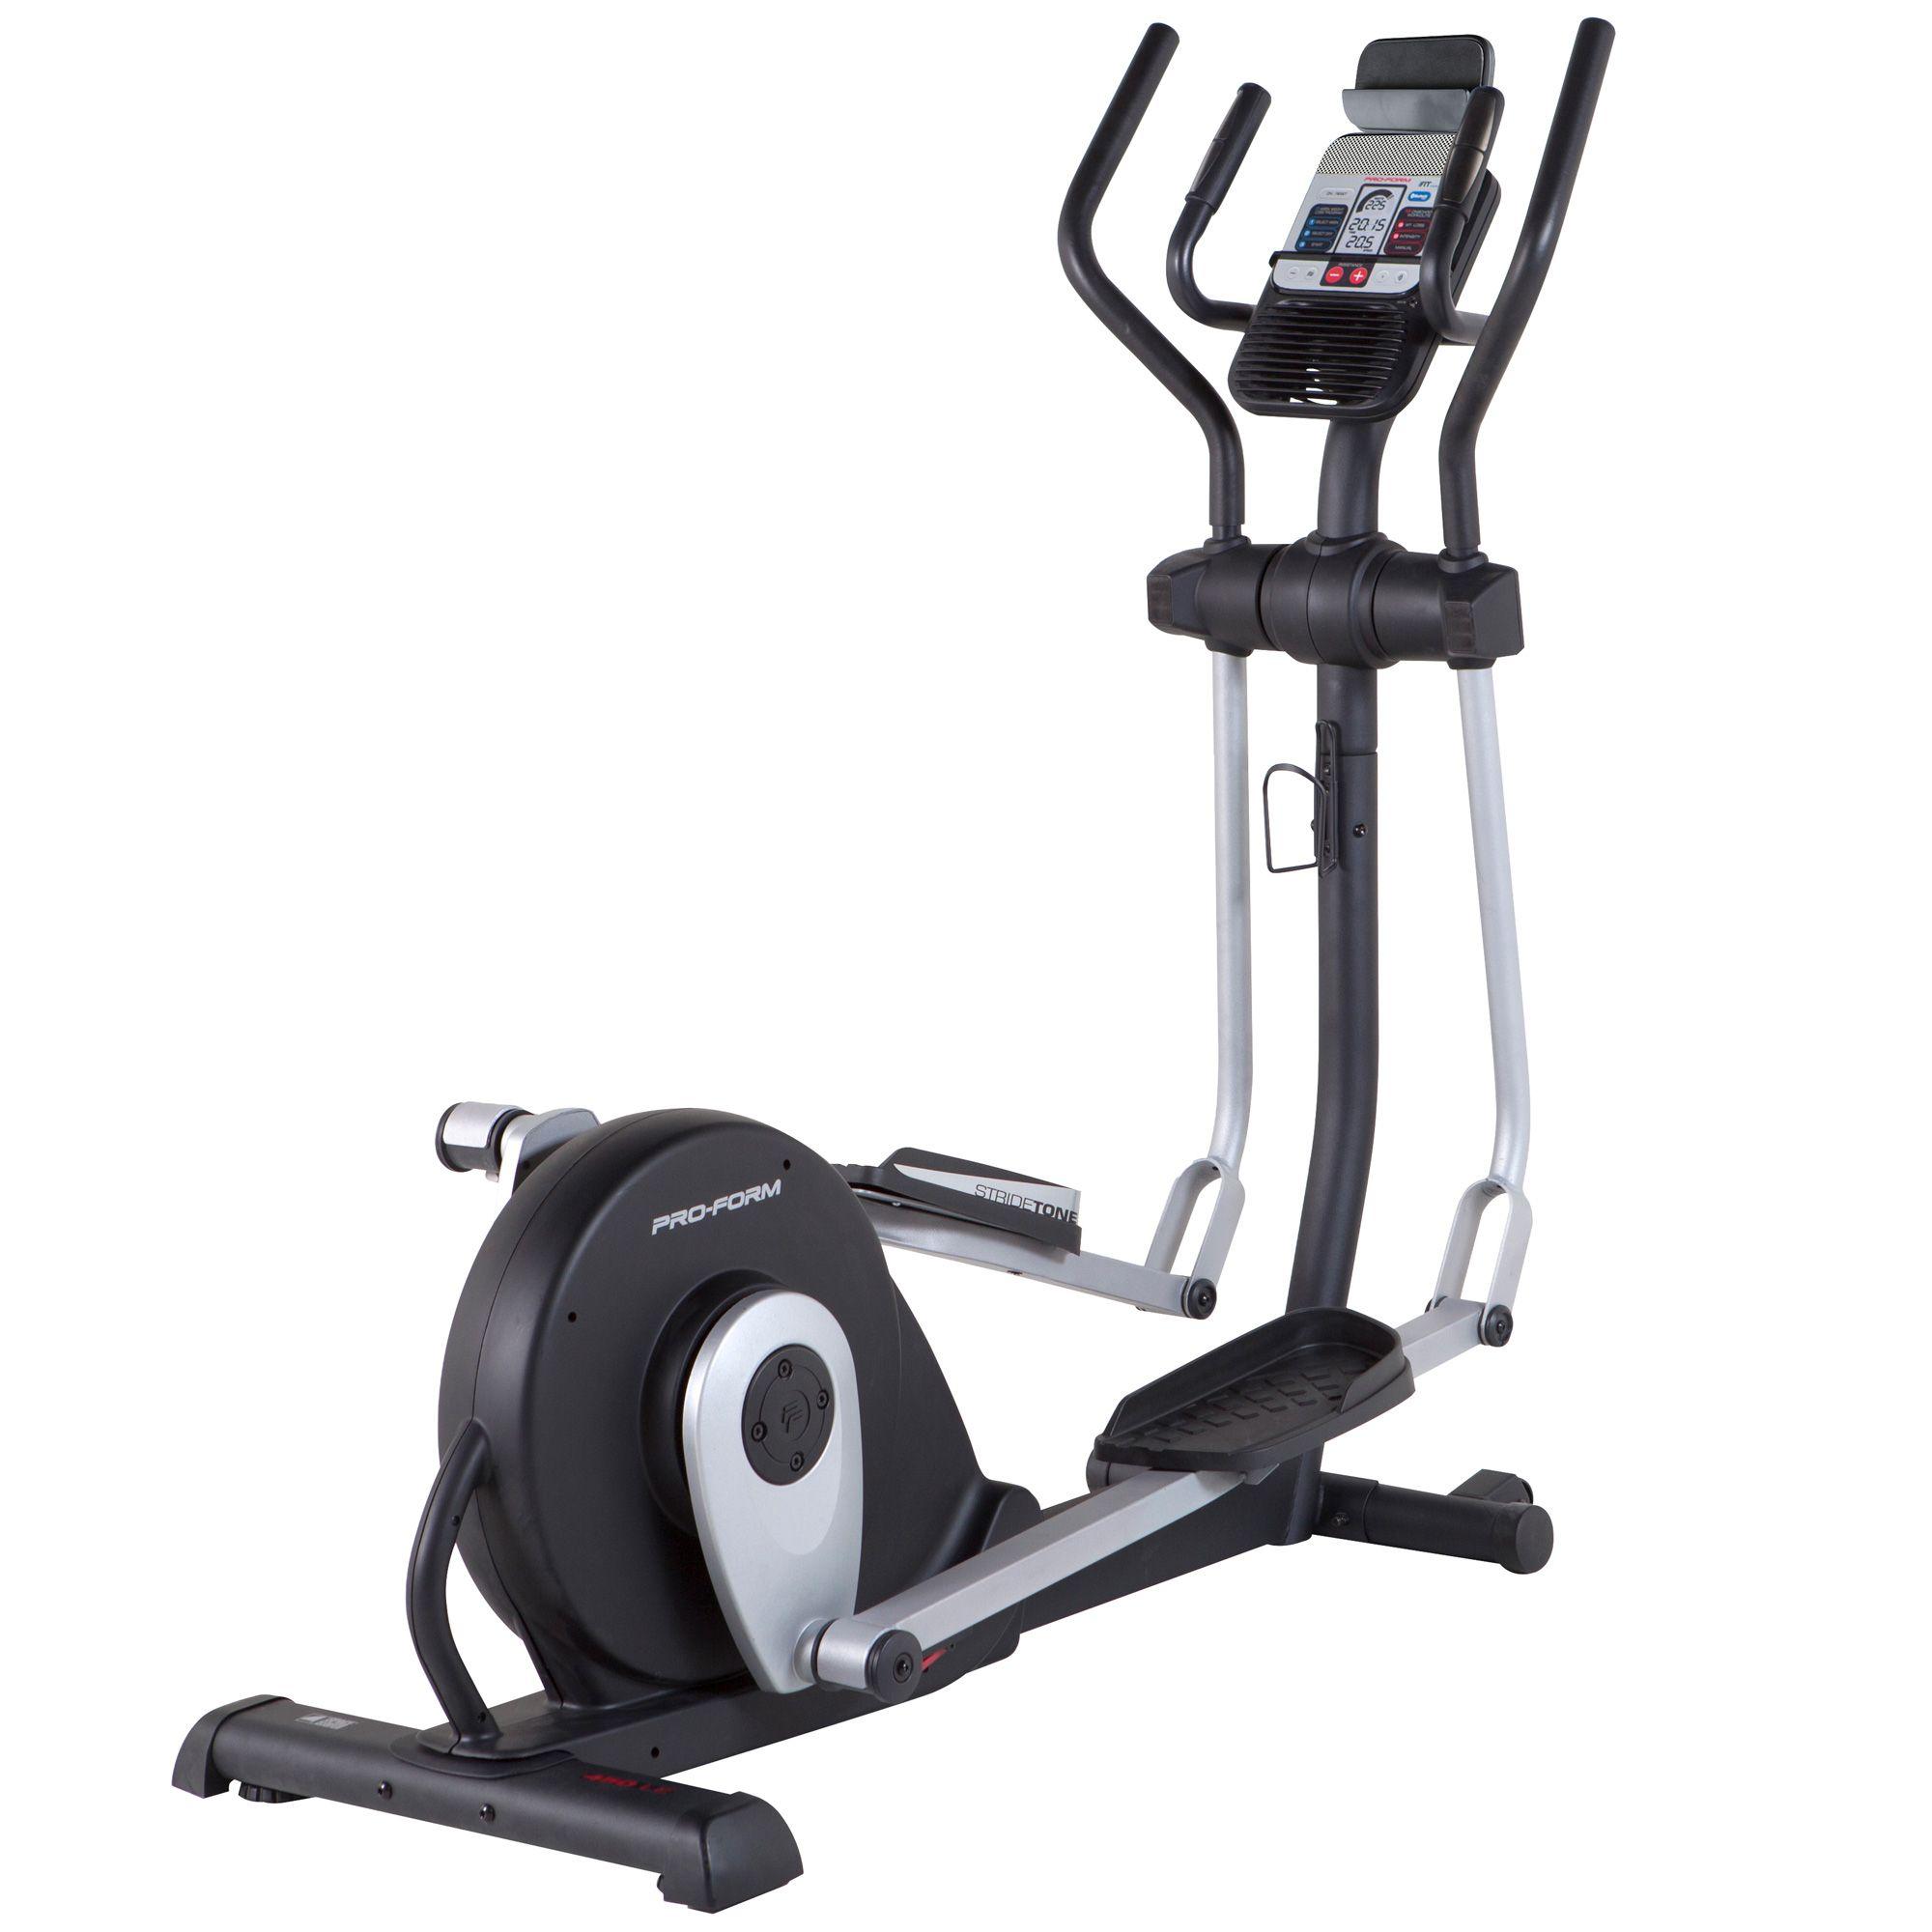 Proform Compact Fitness Package Sweatband Com